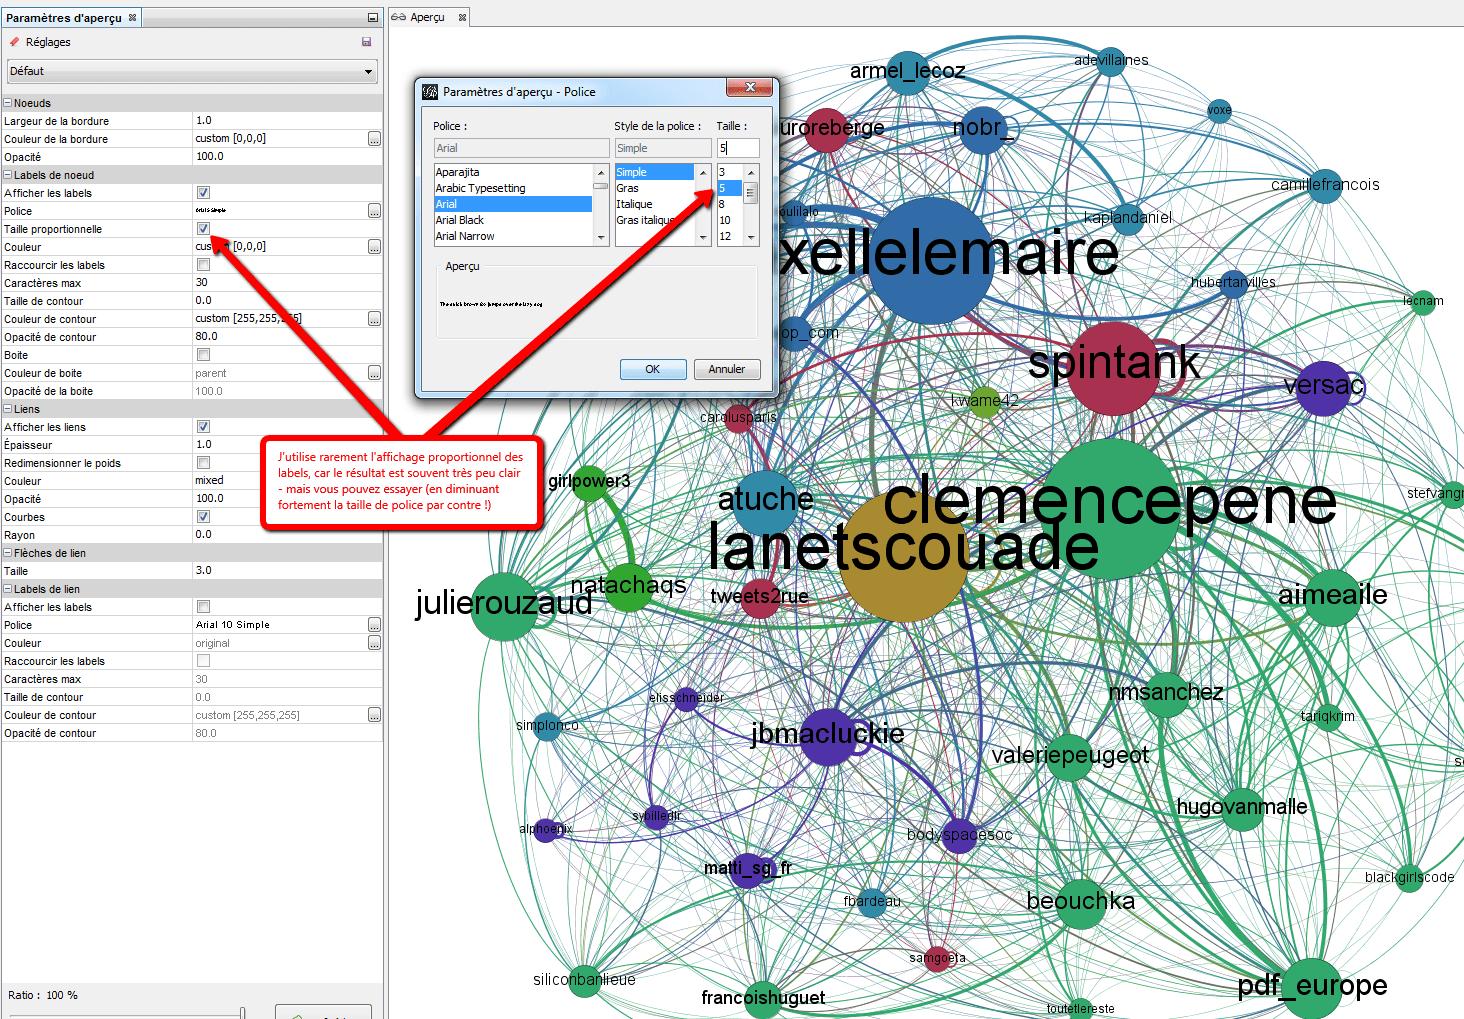 09_pdffrance_parametres_apercu_labels